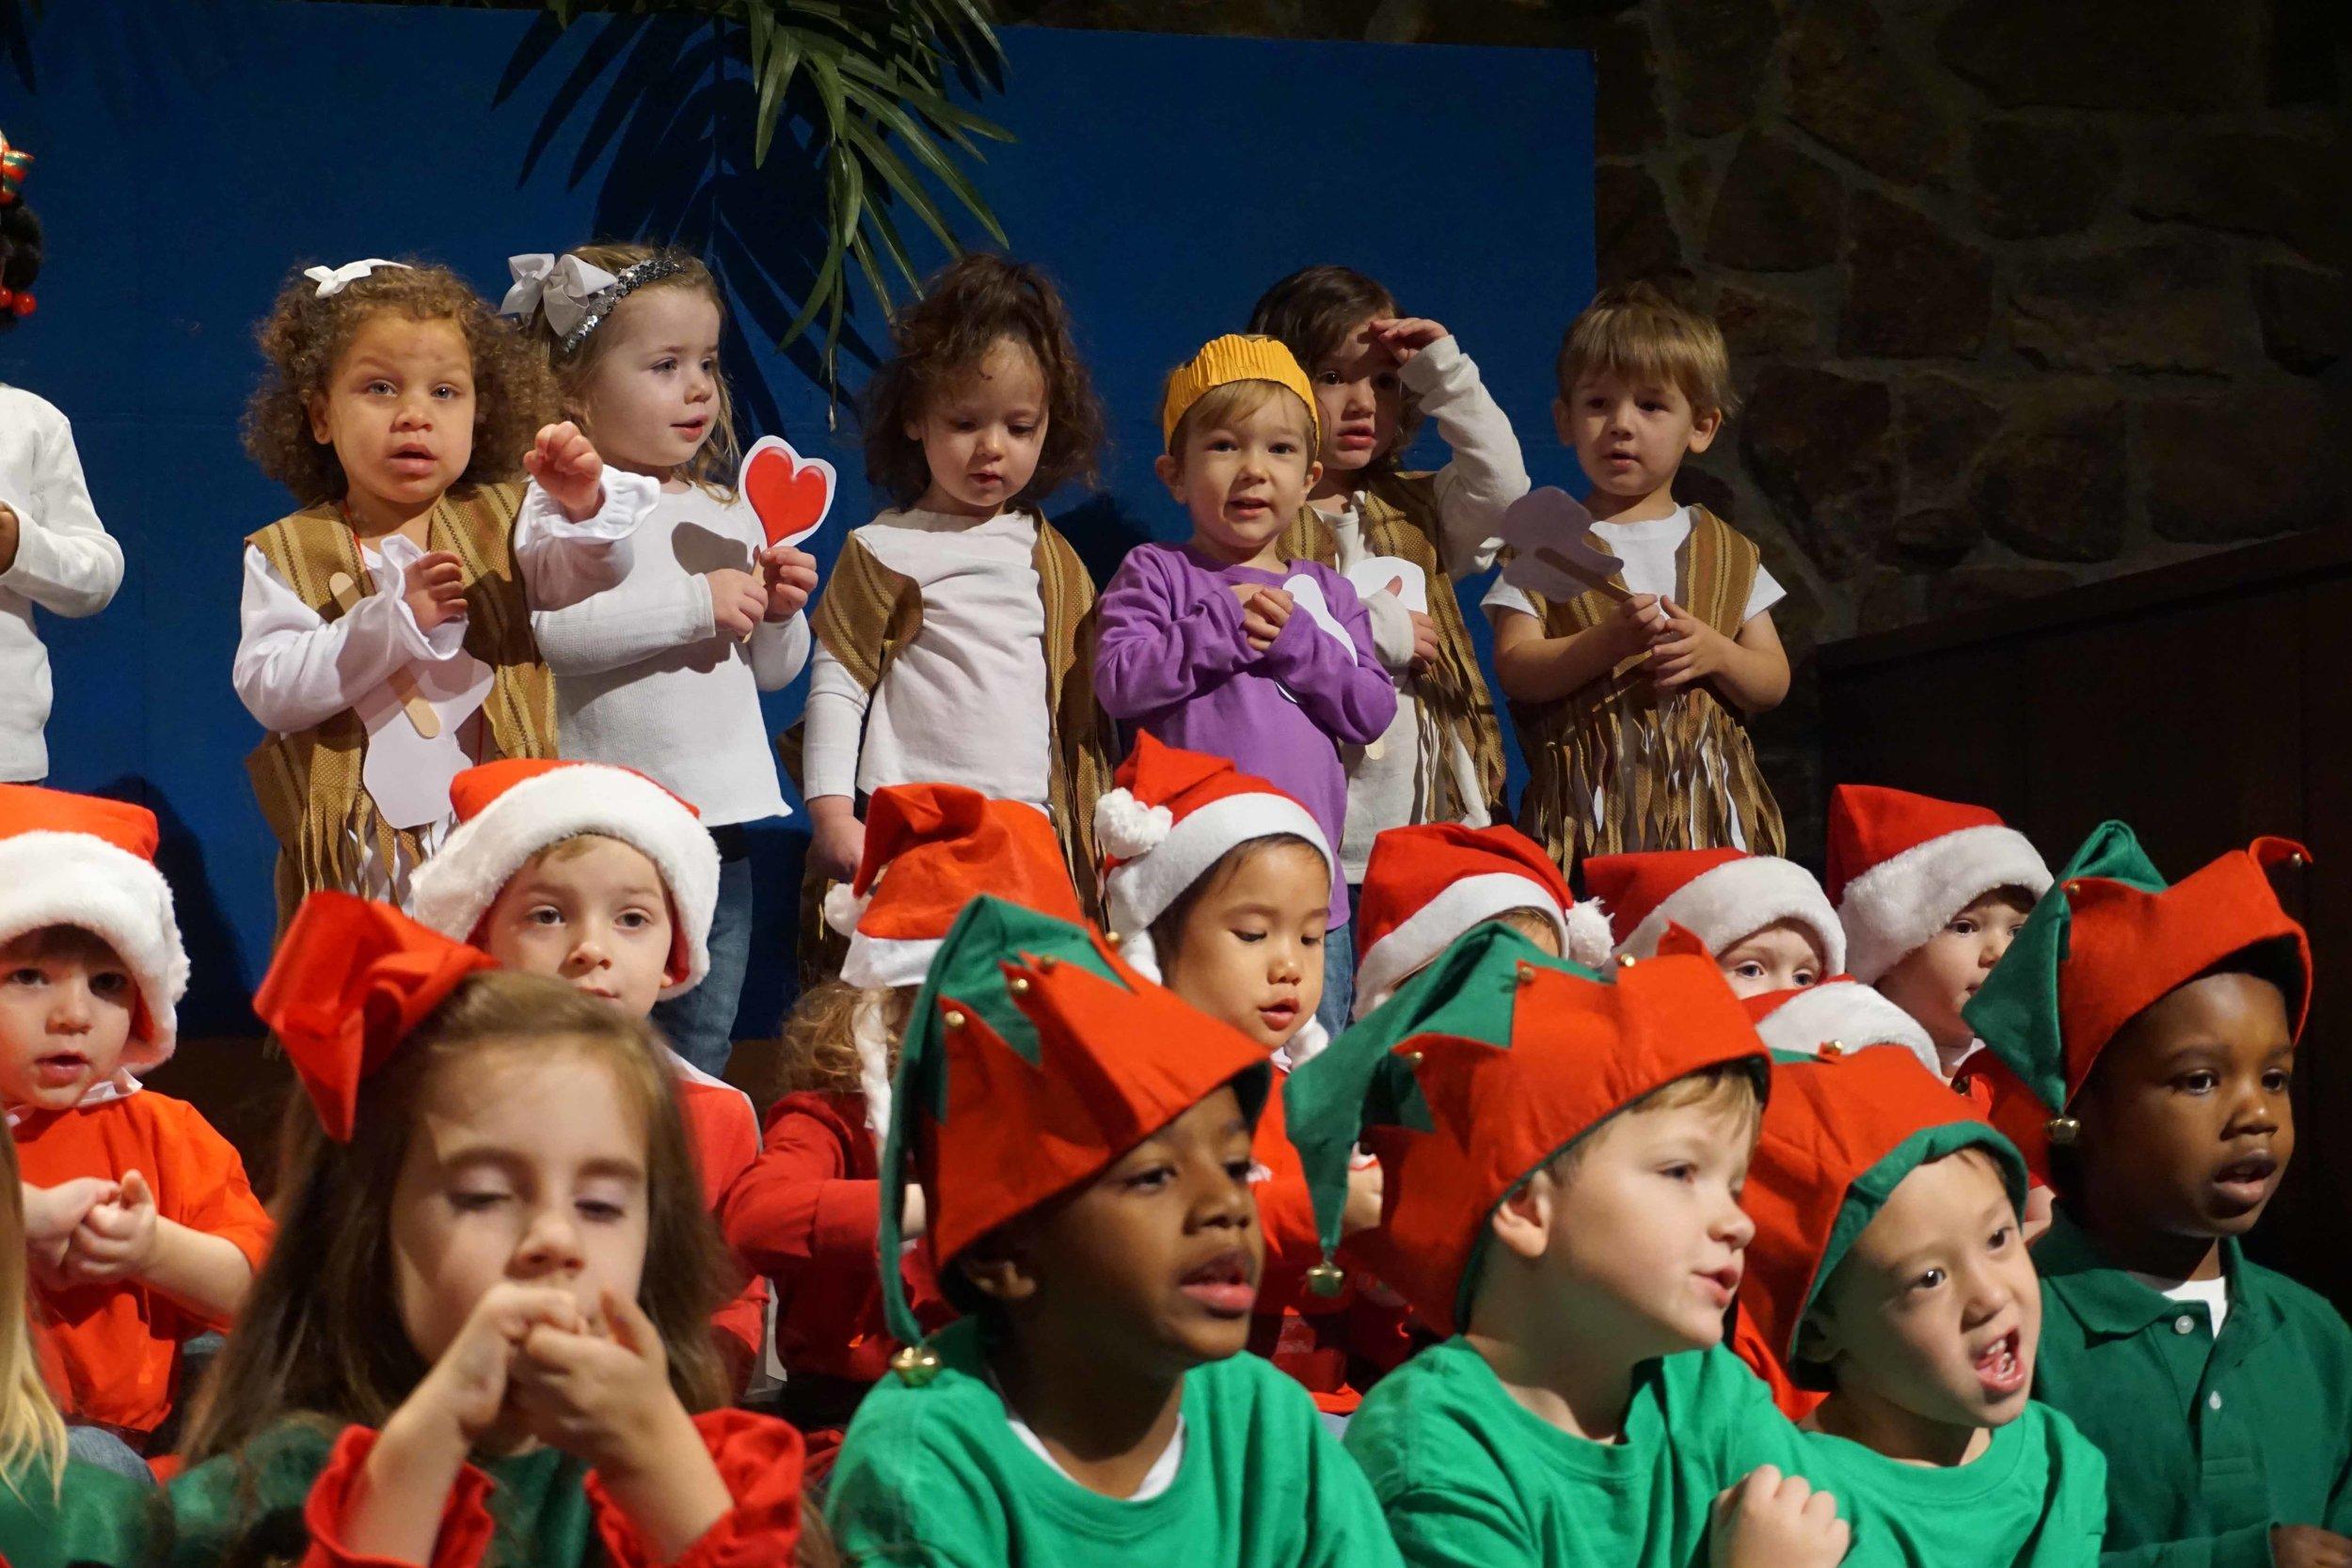 Dec13 WSLH ChristmasProgramTinyTravelers&HappyCamp60.jpg